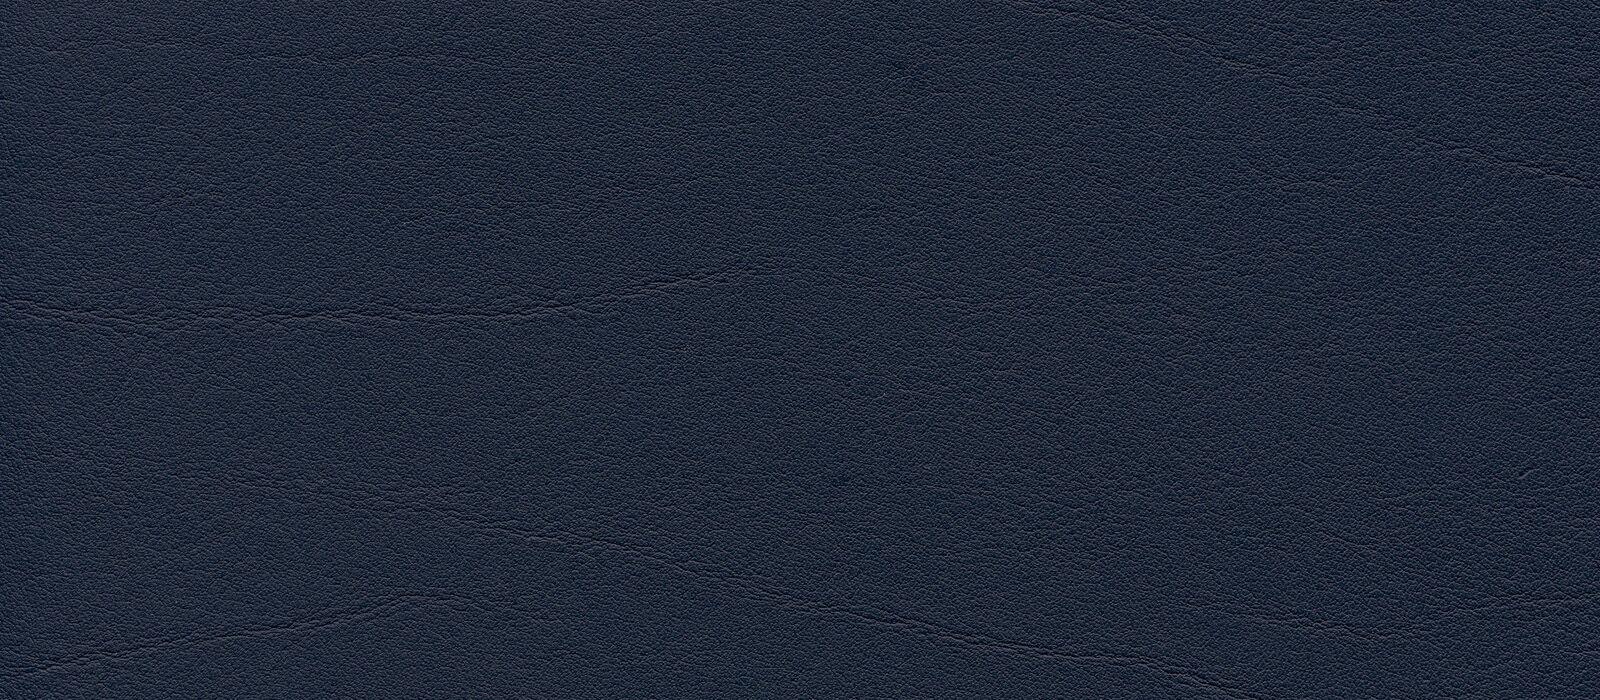 skai Tundra  ocean